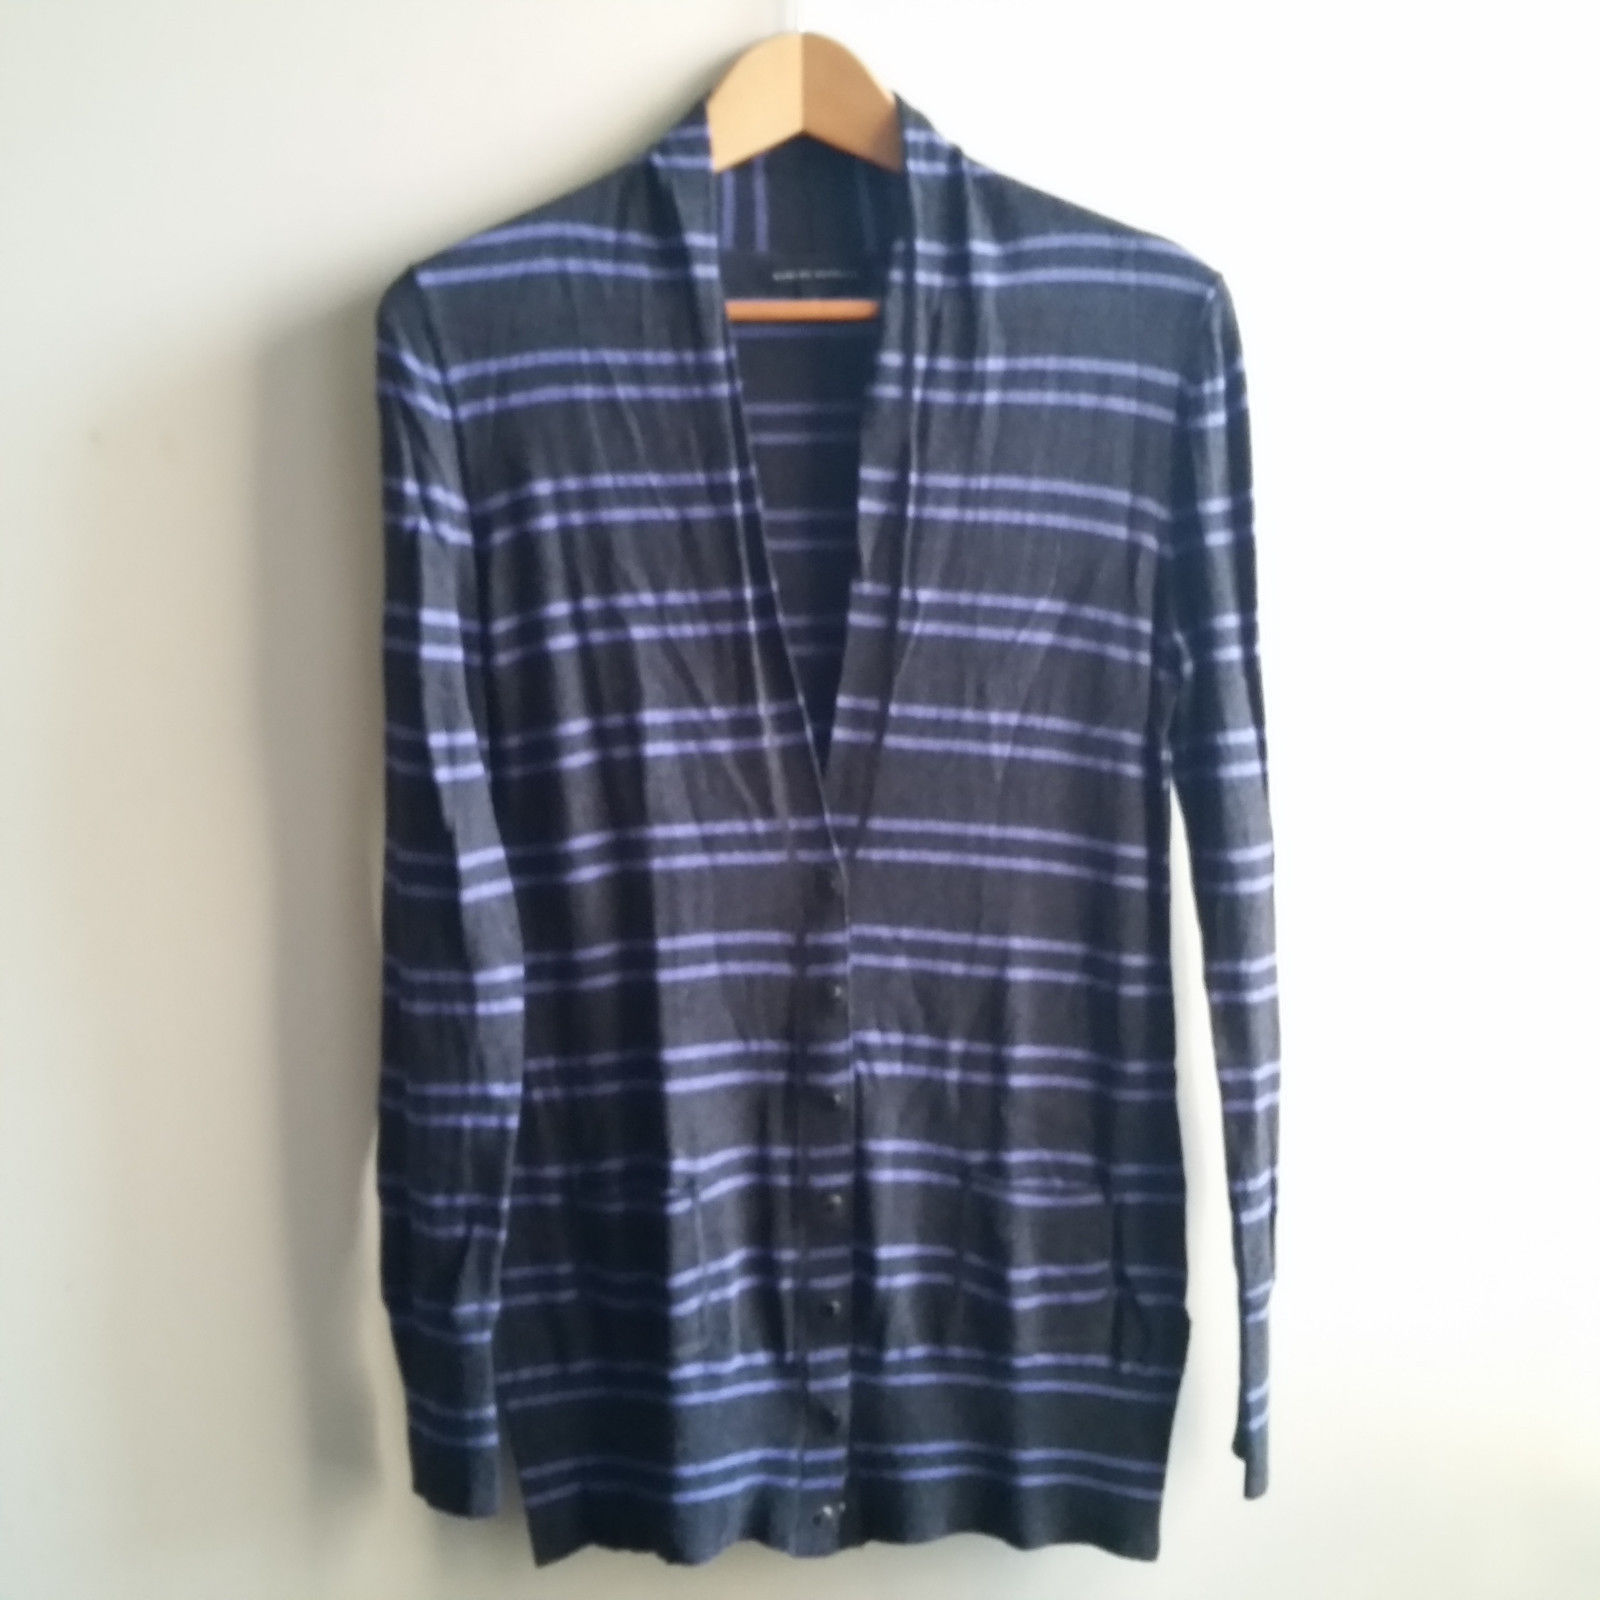 f624e2b31430e8 Banana Republic Striped Cardigan Sweater and 50 similar items. S l1600